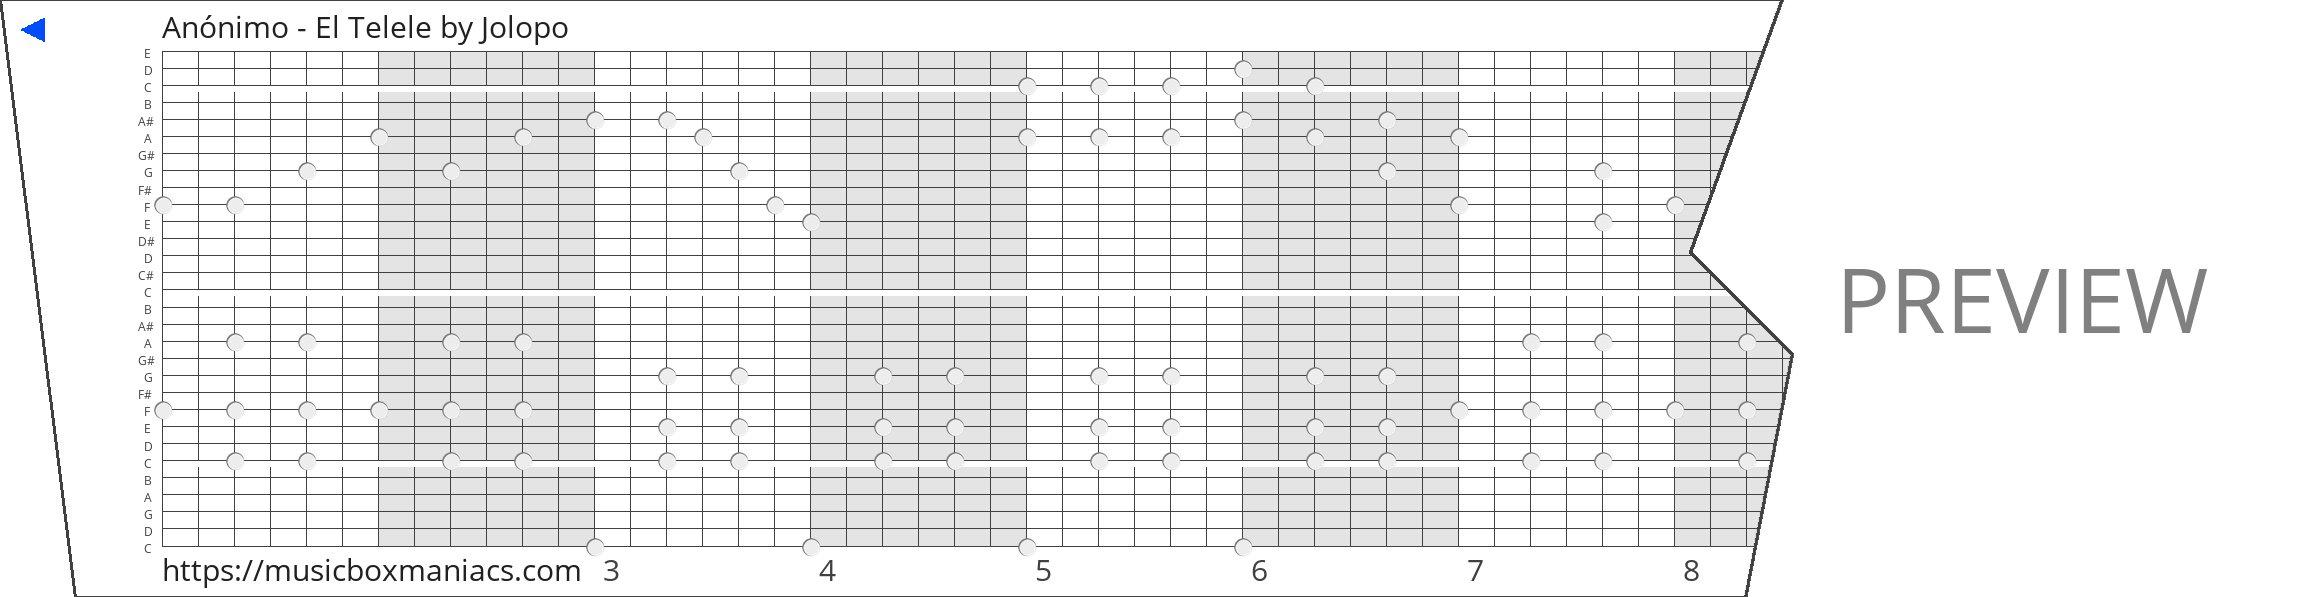 Anónimo - El Telele 30 note music box paper strip